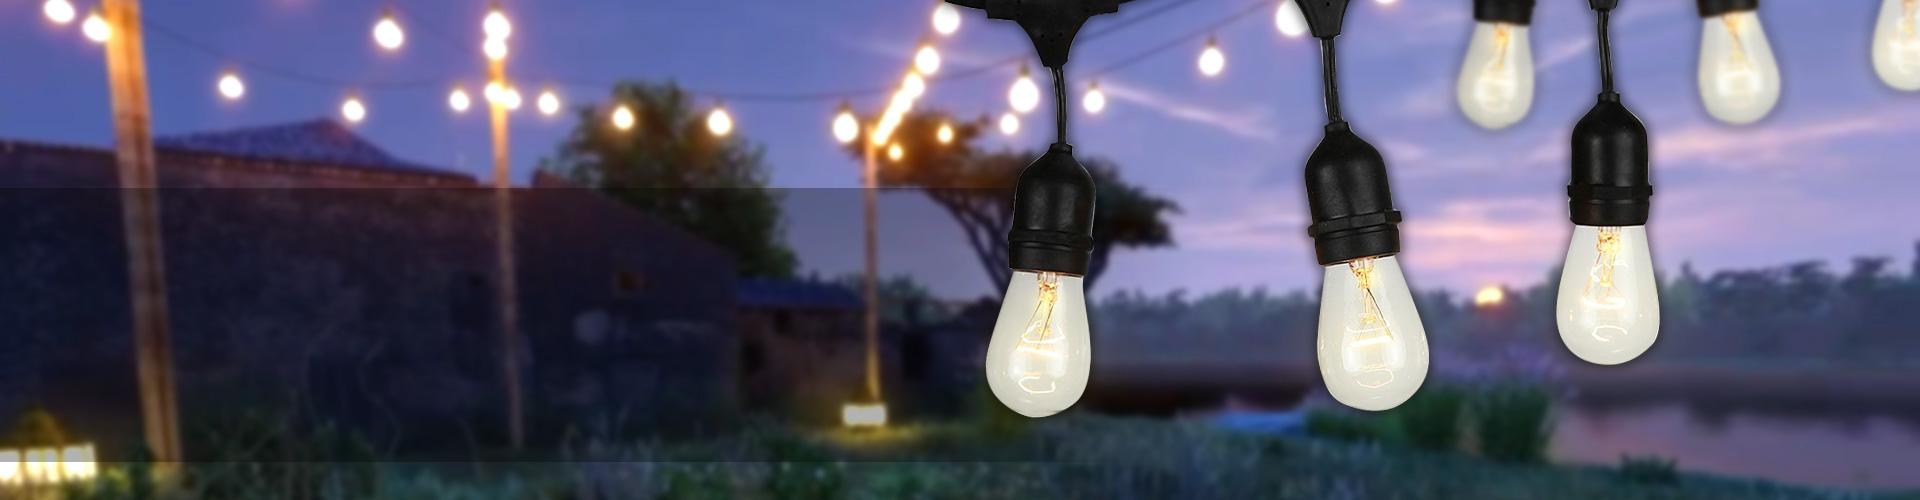 string-lights-bg